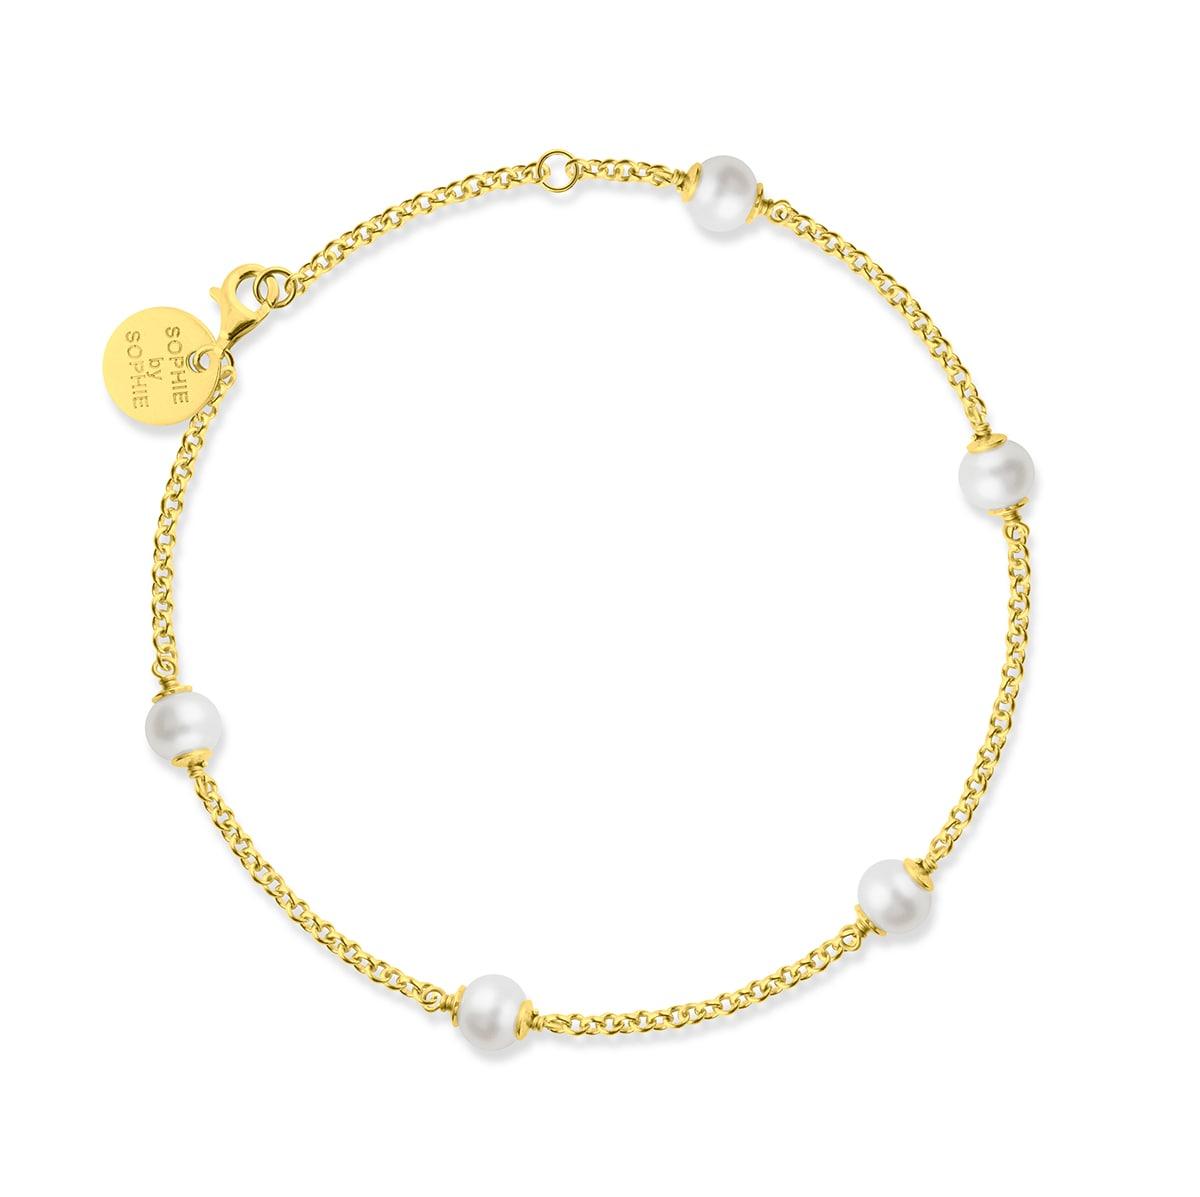 Sophie_by_Sophie_Funky_pearl_bracelet_E1892GPPE-OS_hos_Jarl_Sandin